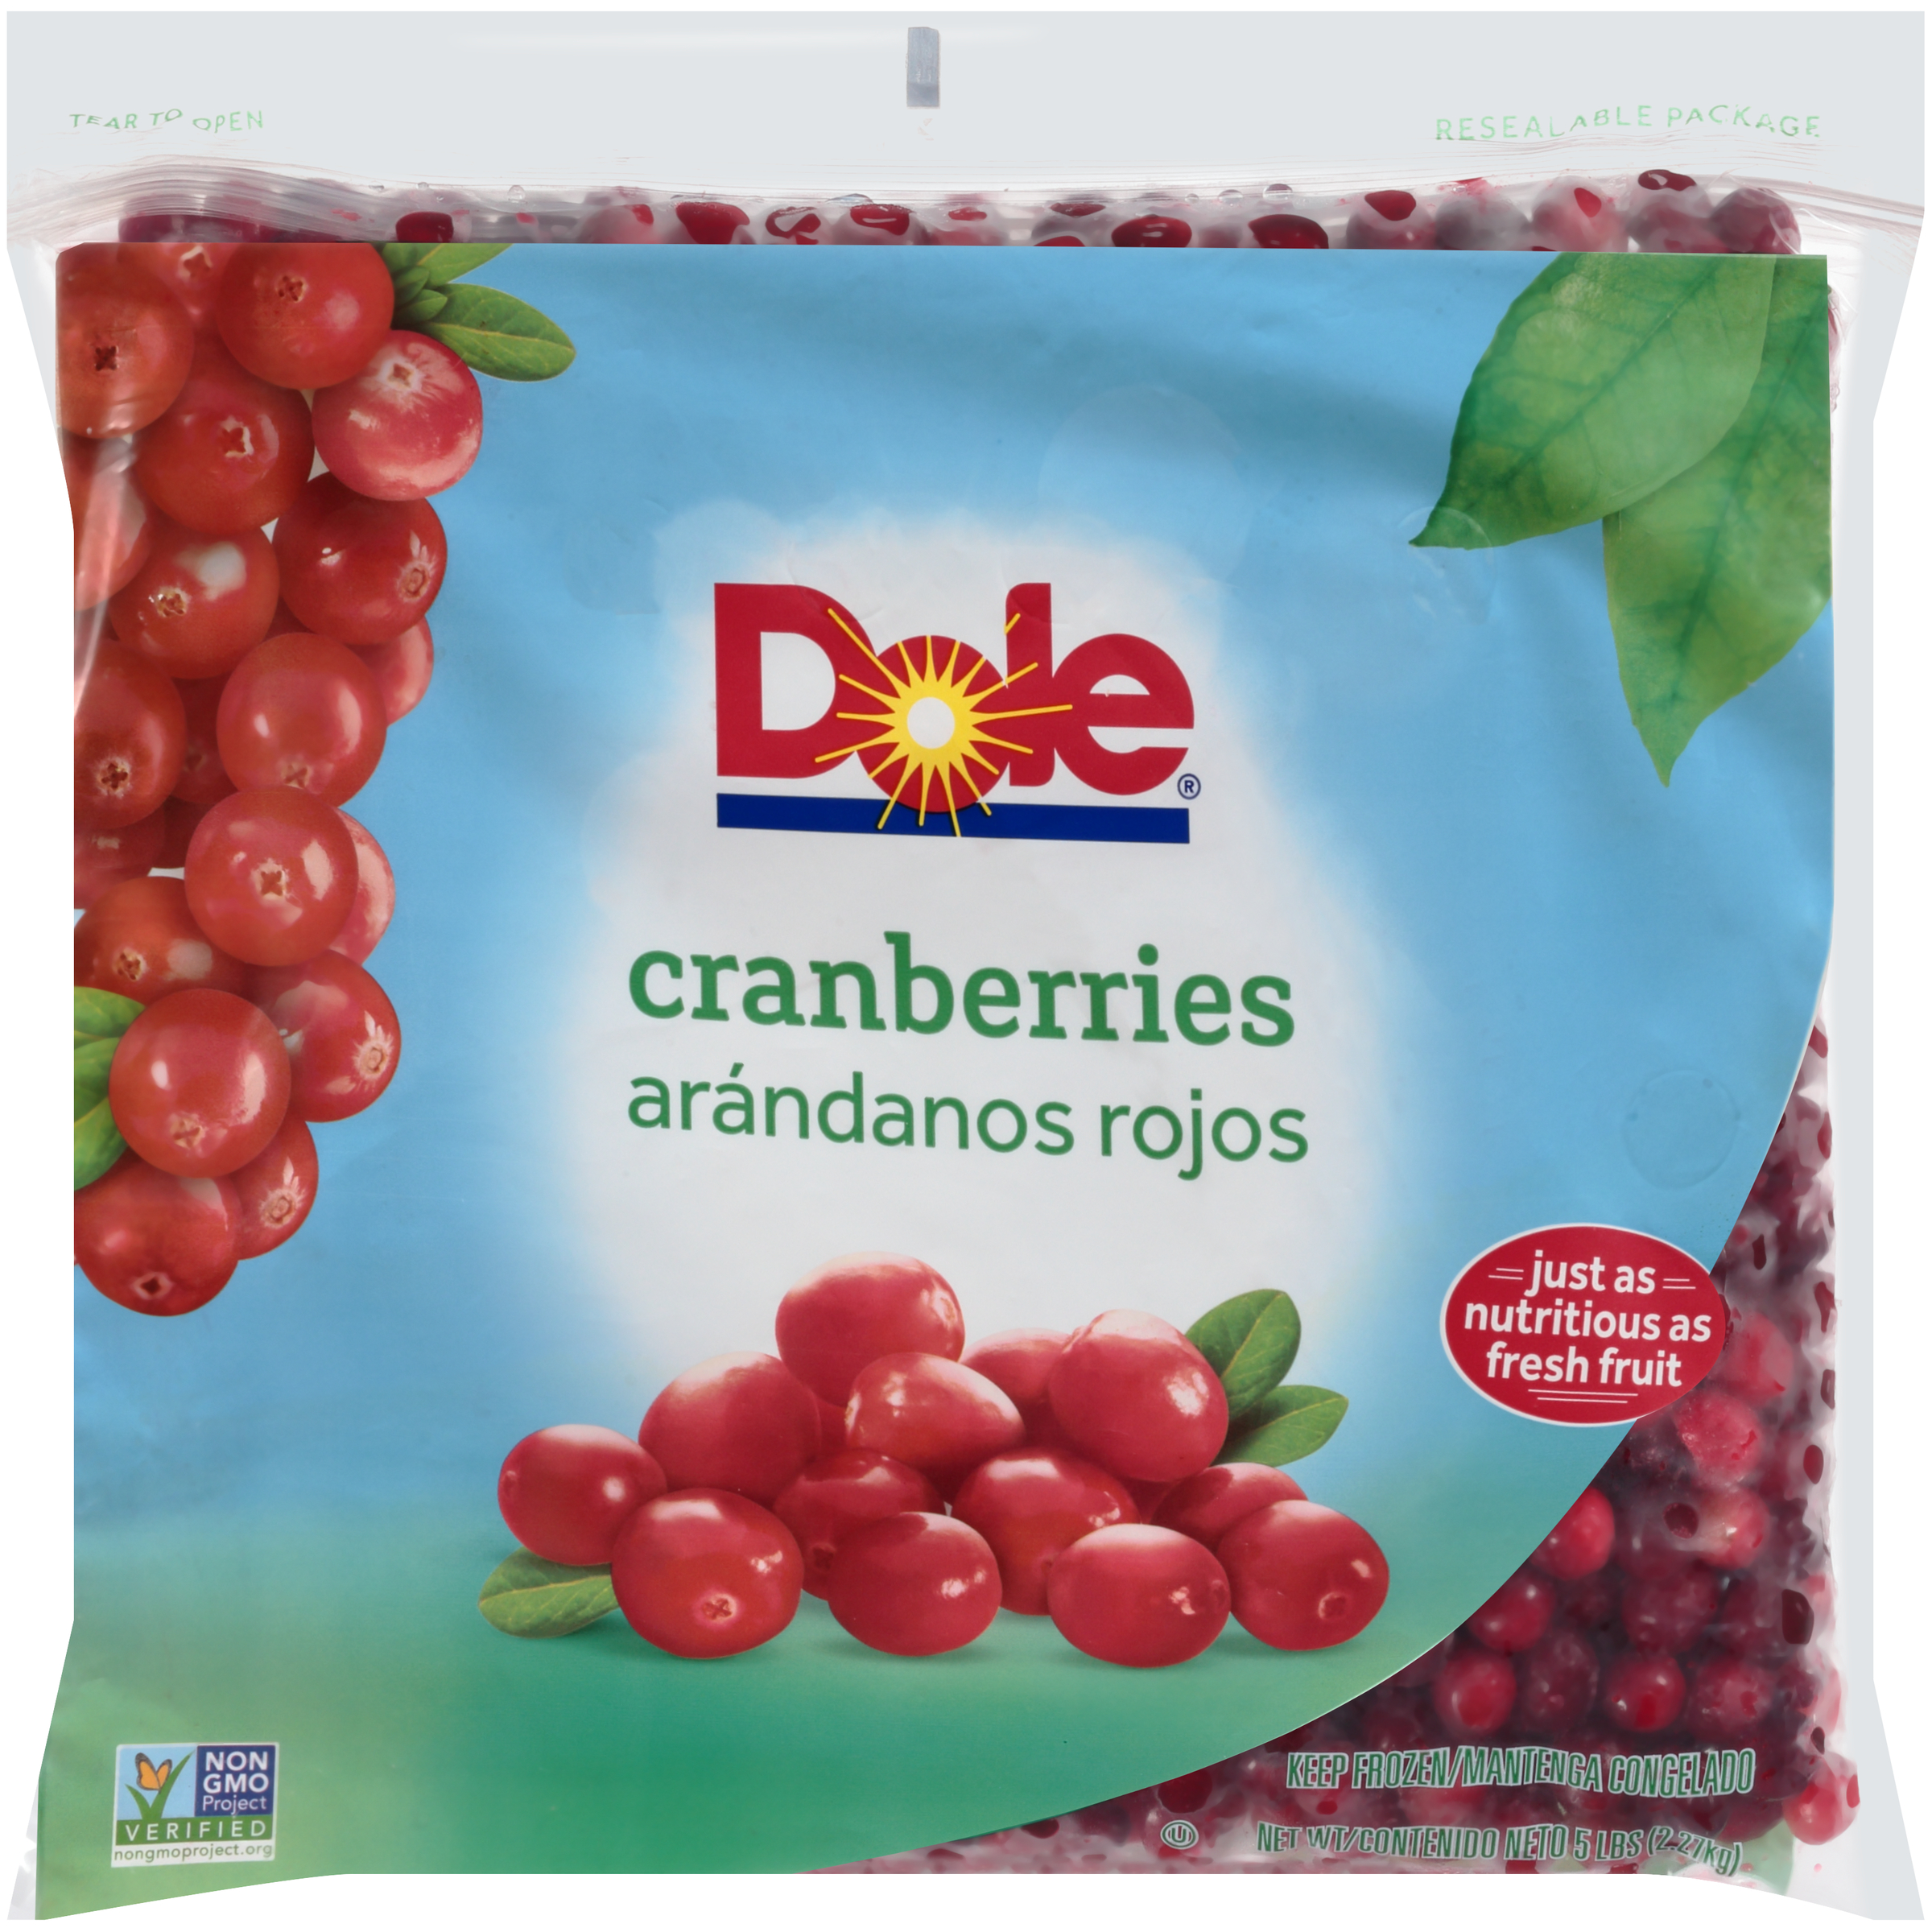 2/5# Cranberries, Whole IQF